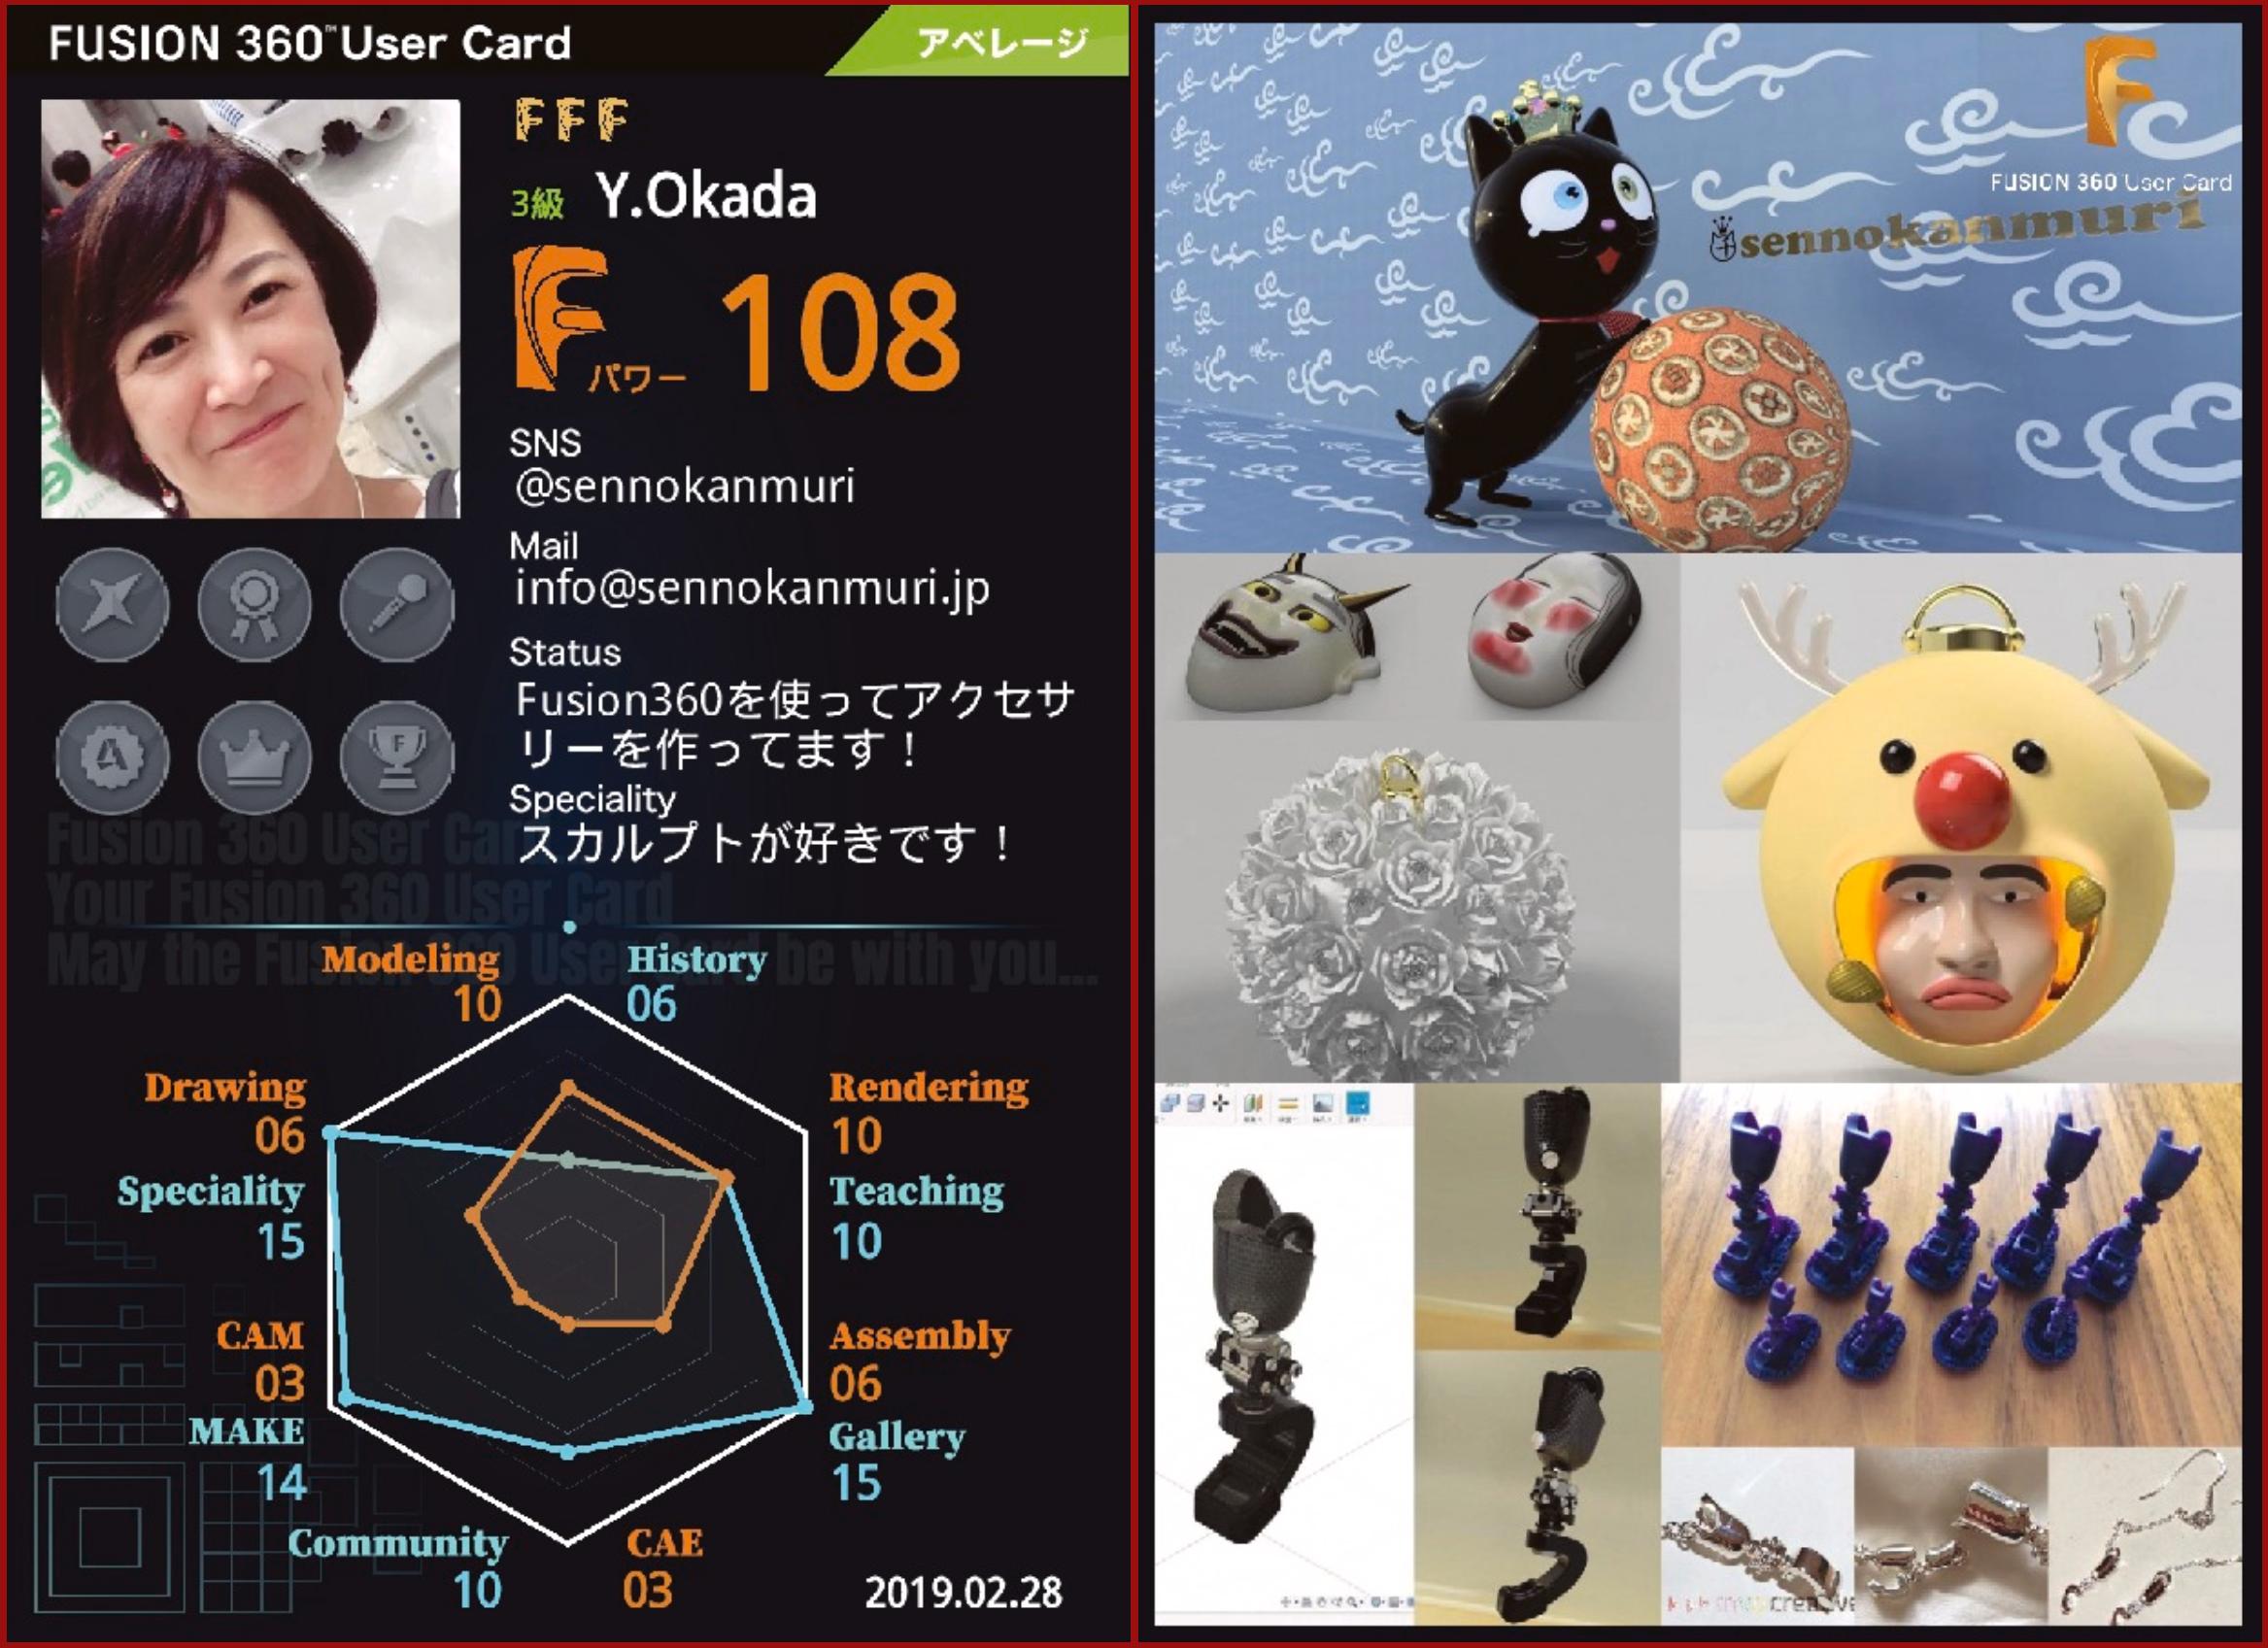 Fusion360 User Card